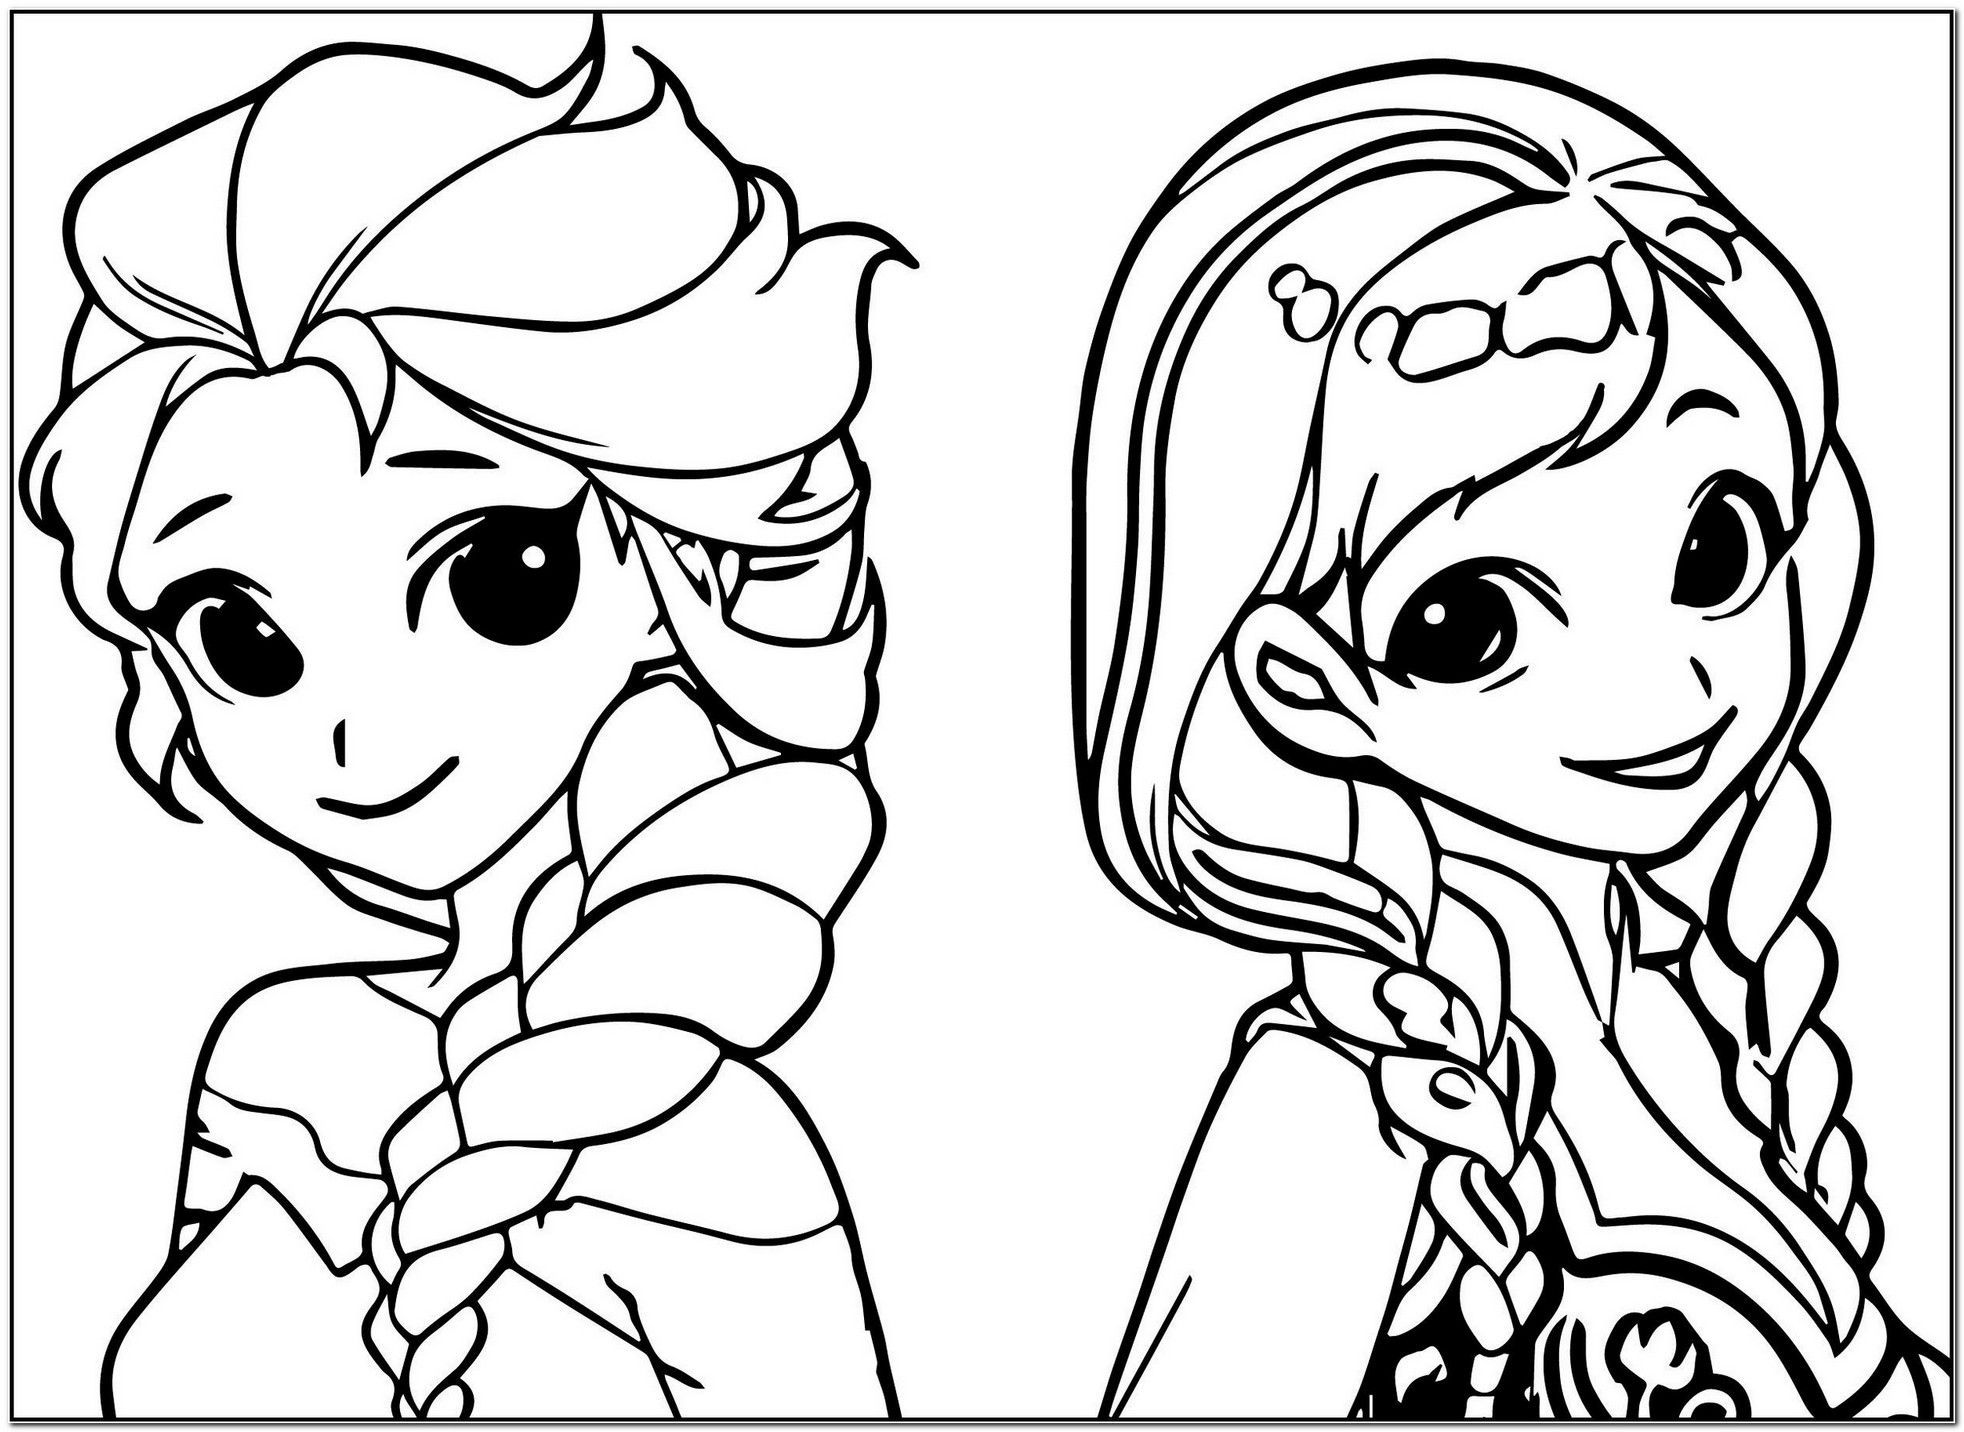 Coloring Page Elsa And Anna Free Elsa Coloring Pages Frozen Coloring Pages Cartoon Coloring Pages [ jpg ]